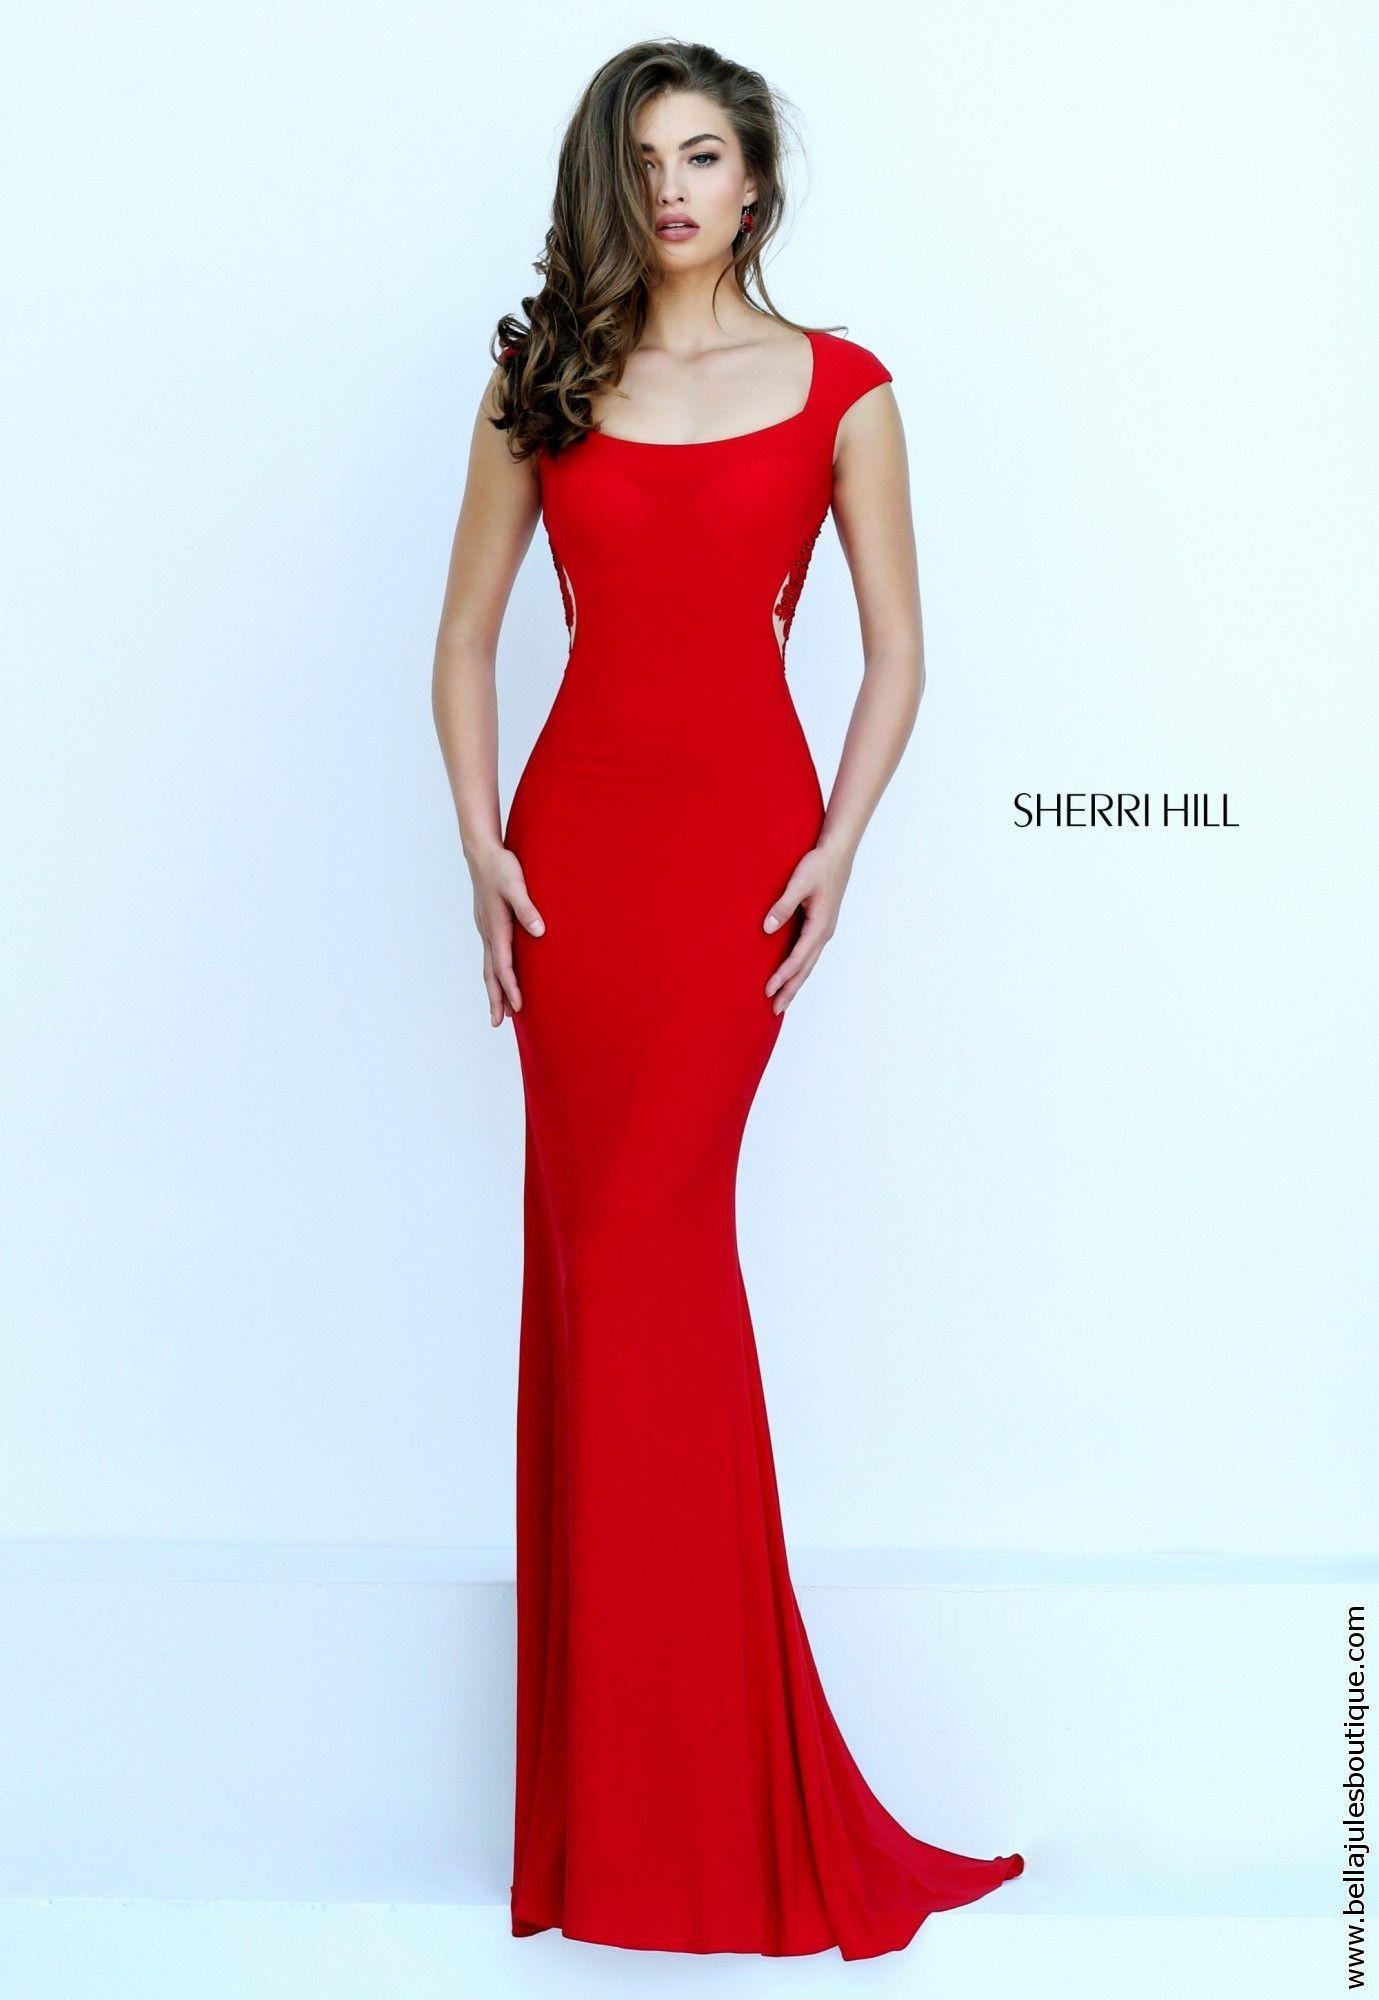 Sherri hill prom dress style dresses pinterest sherri